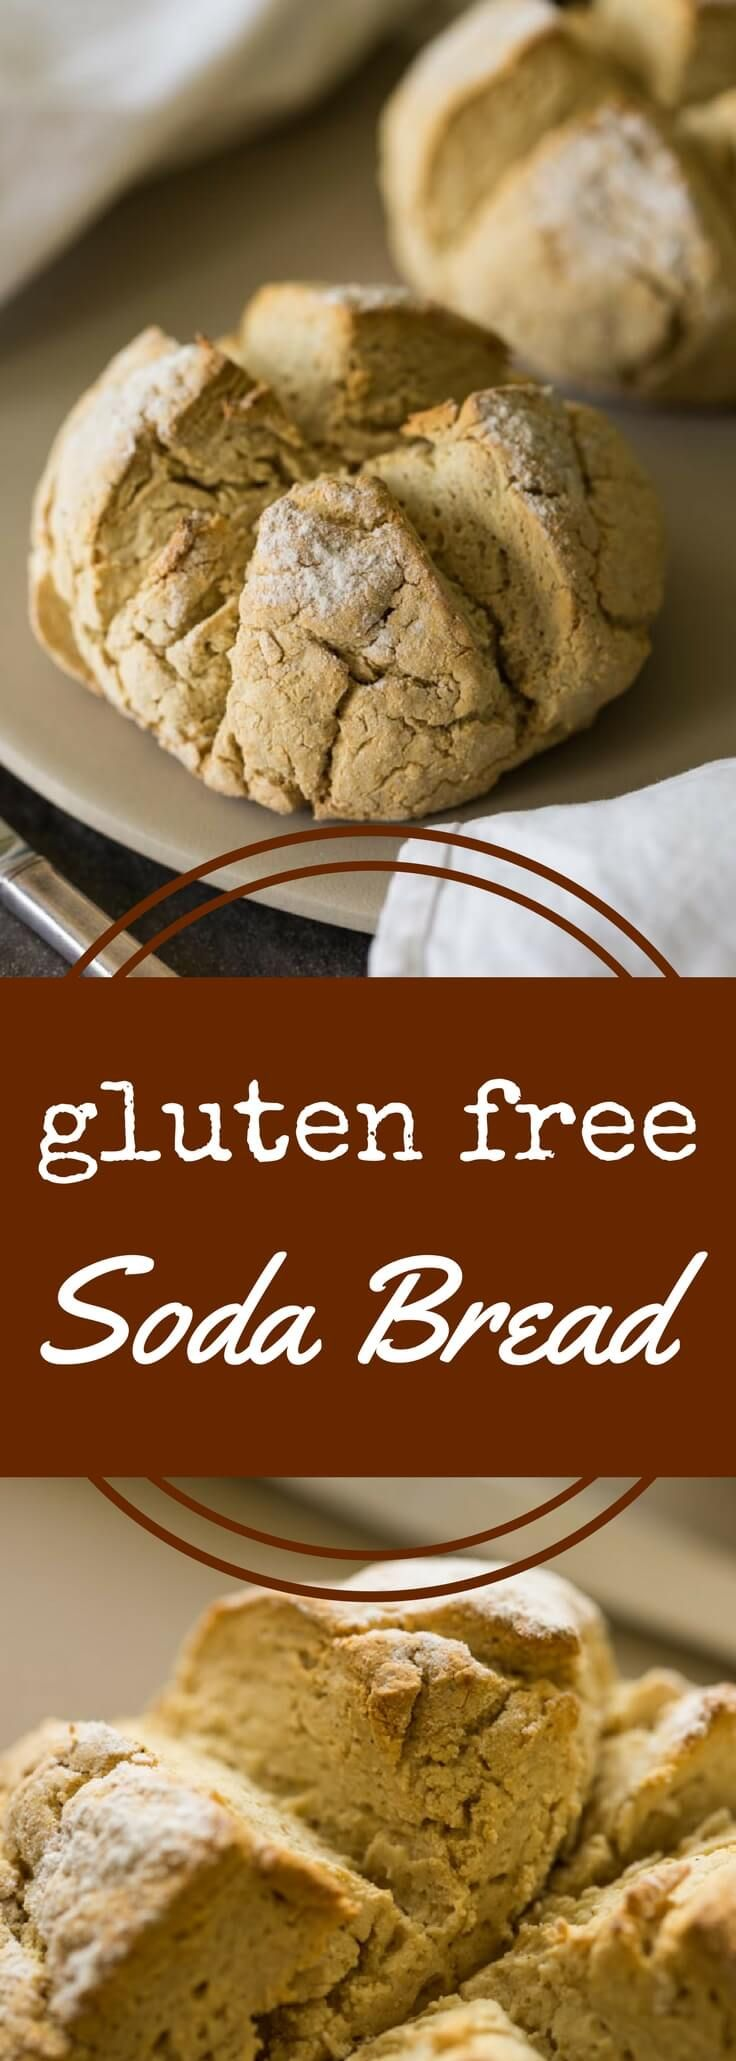 Gluten Free Irish Soda Bread Recipe Food recipes